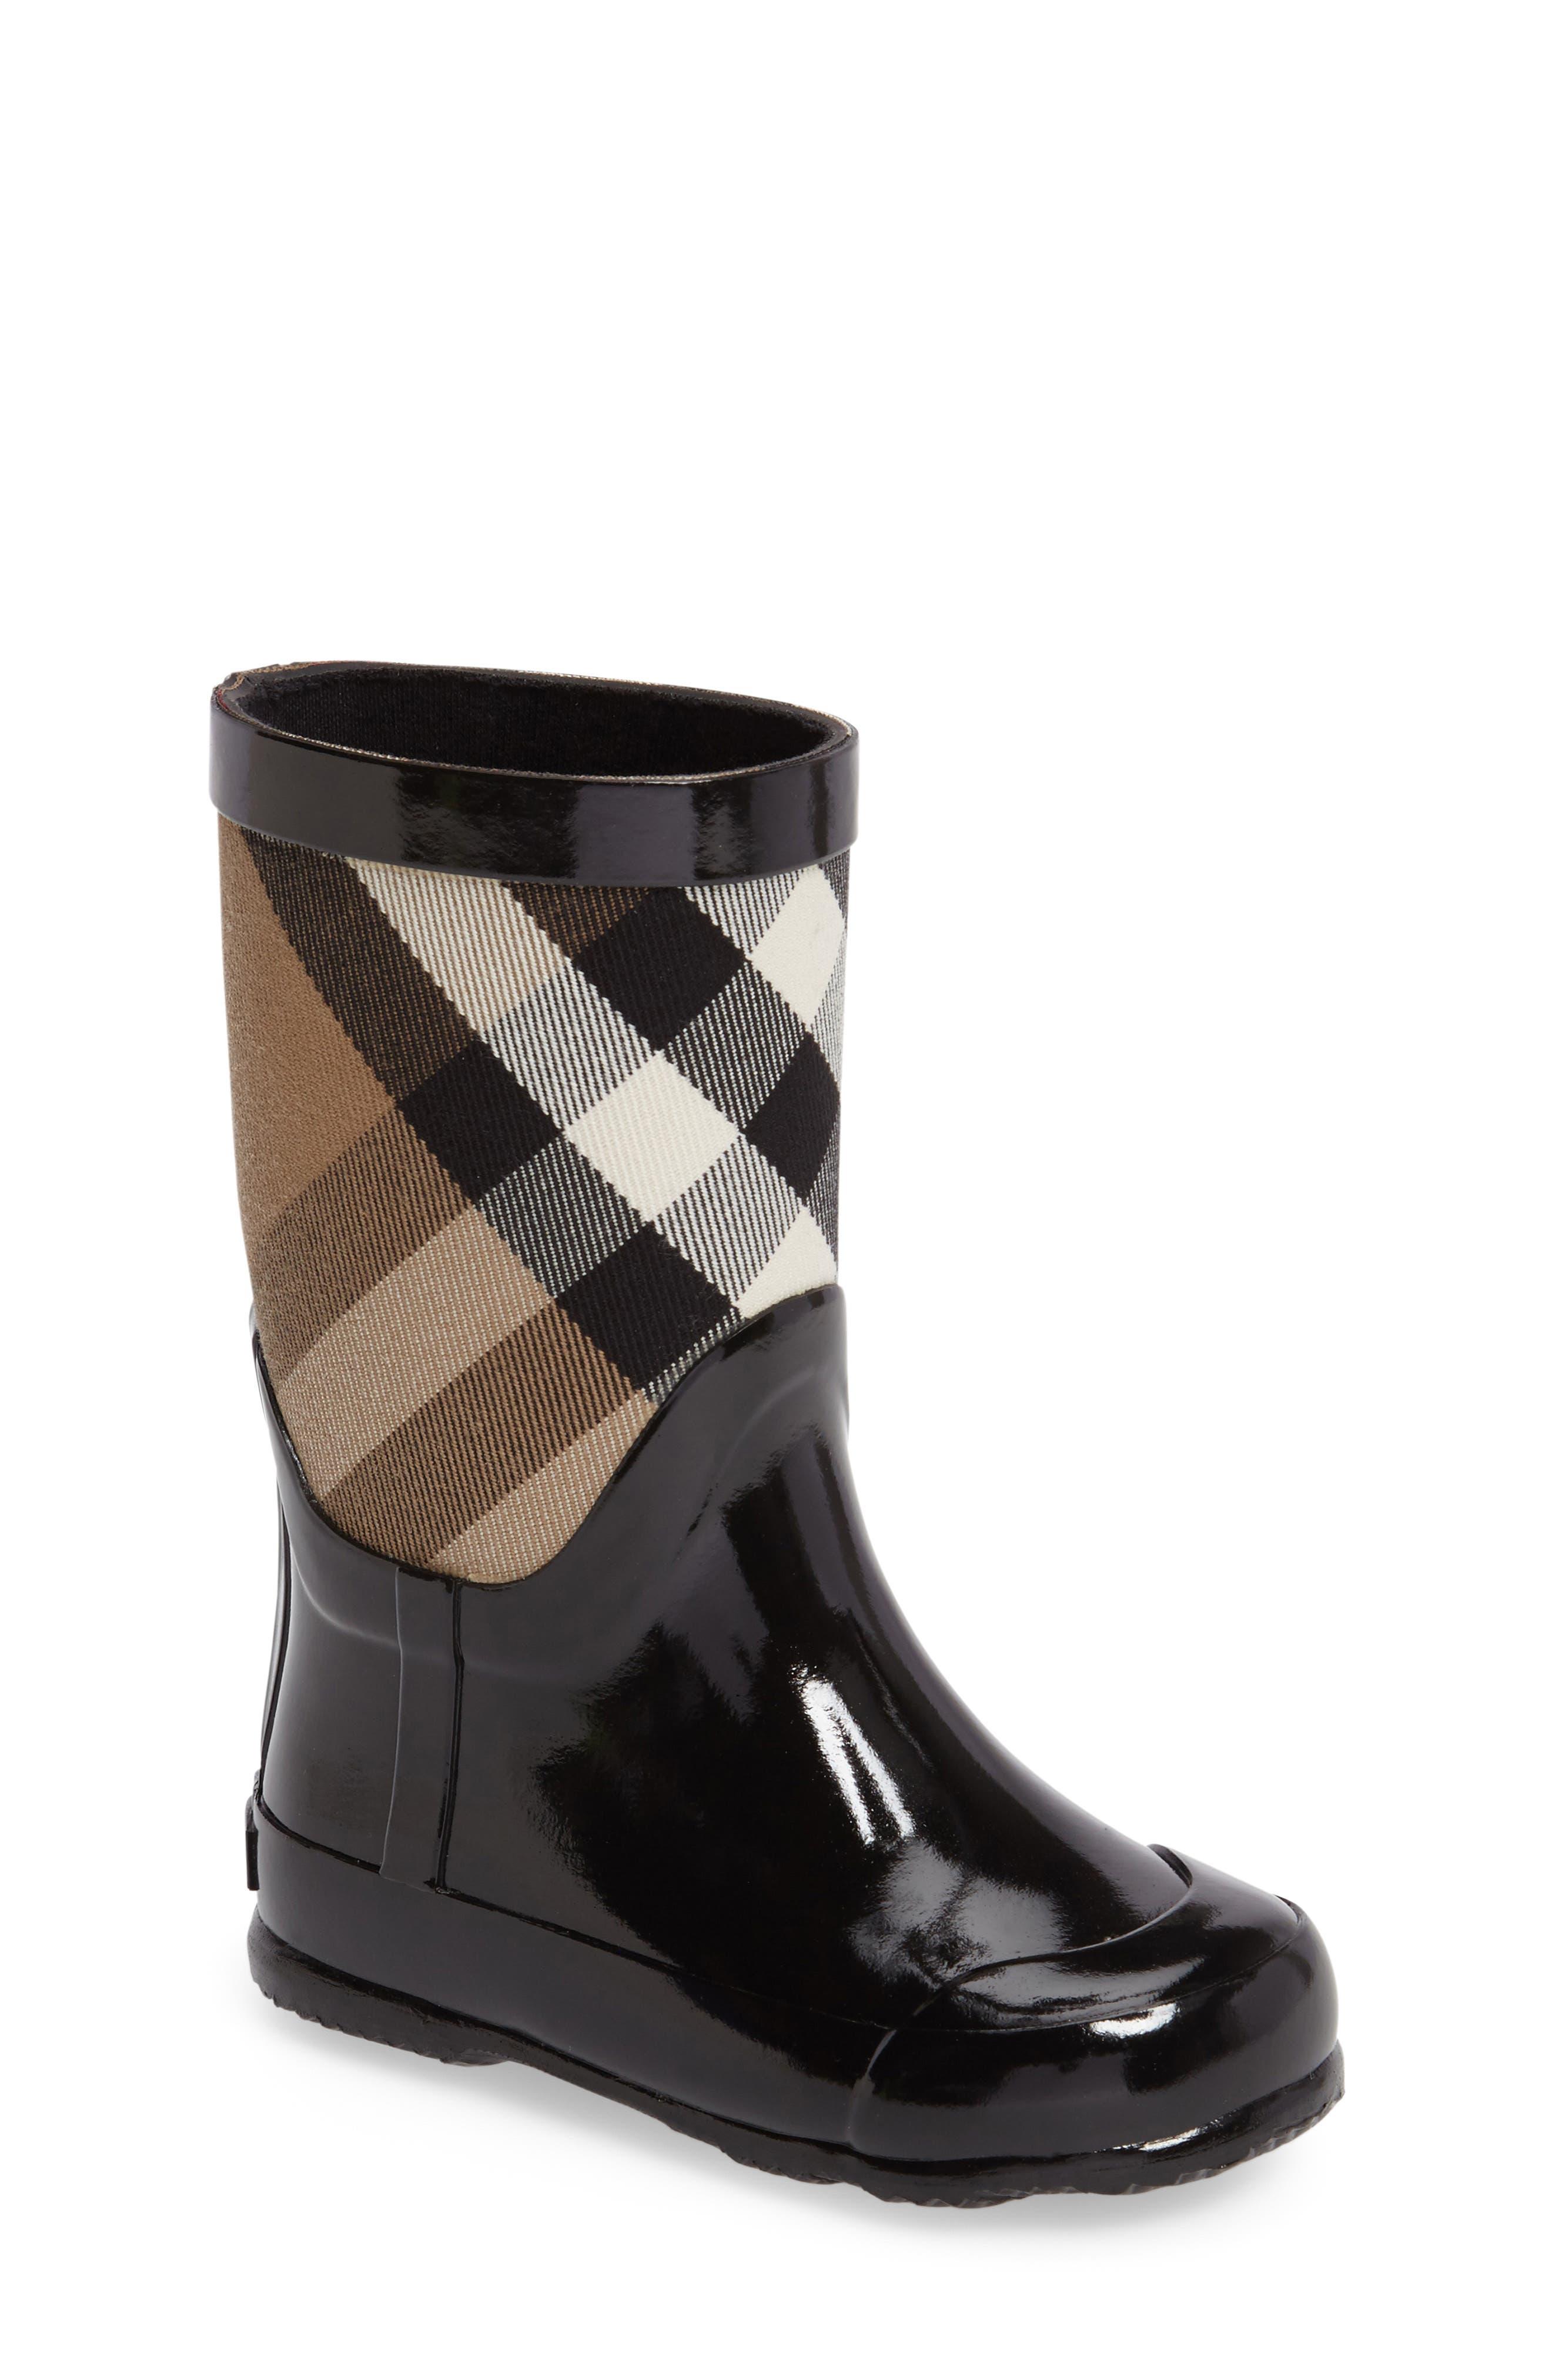 Ranmoor Waterproof Rain Boot,                         Main,                         color, BLACK